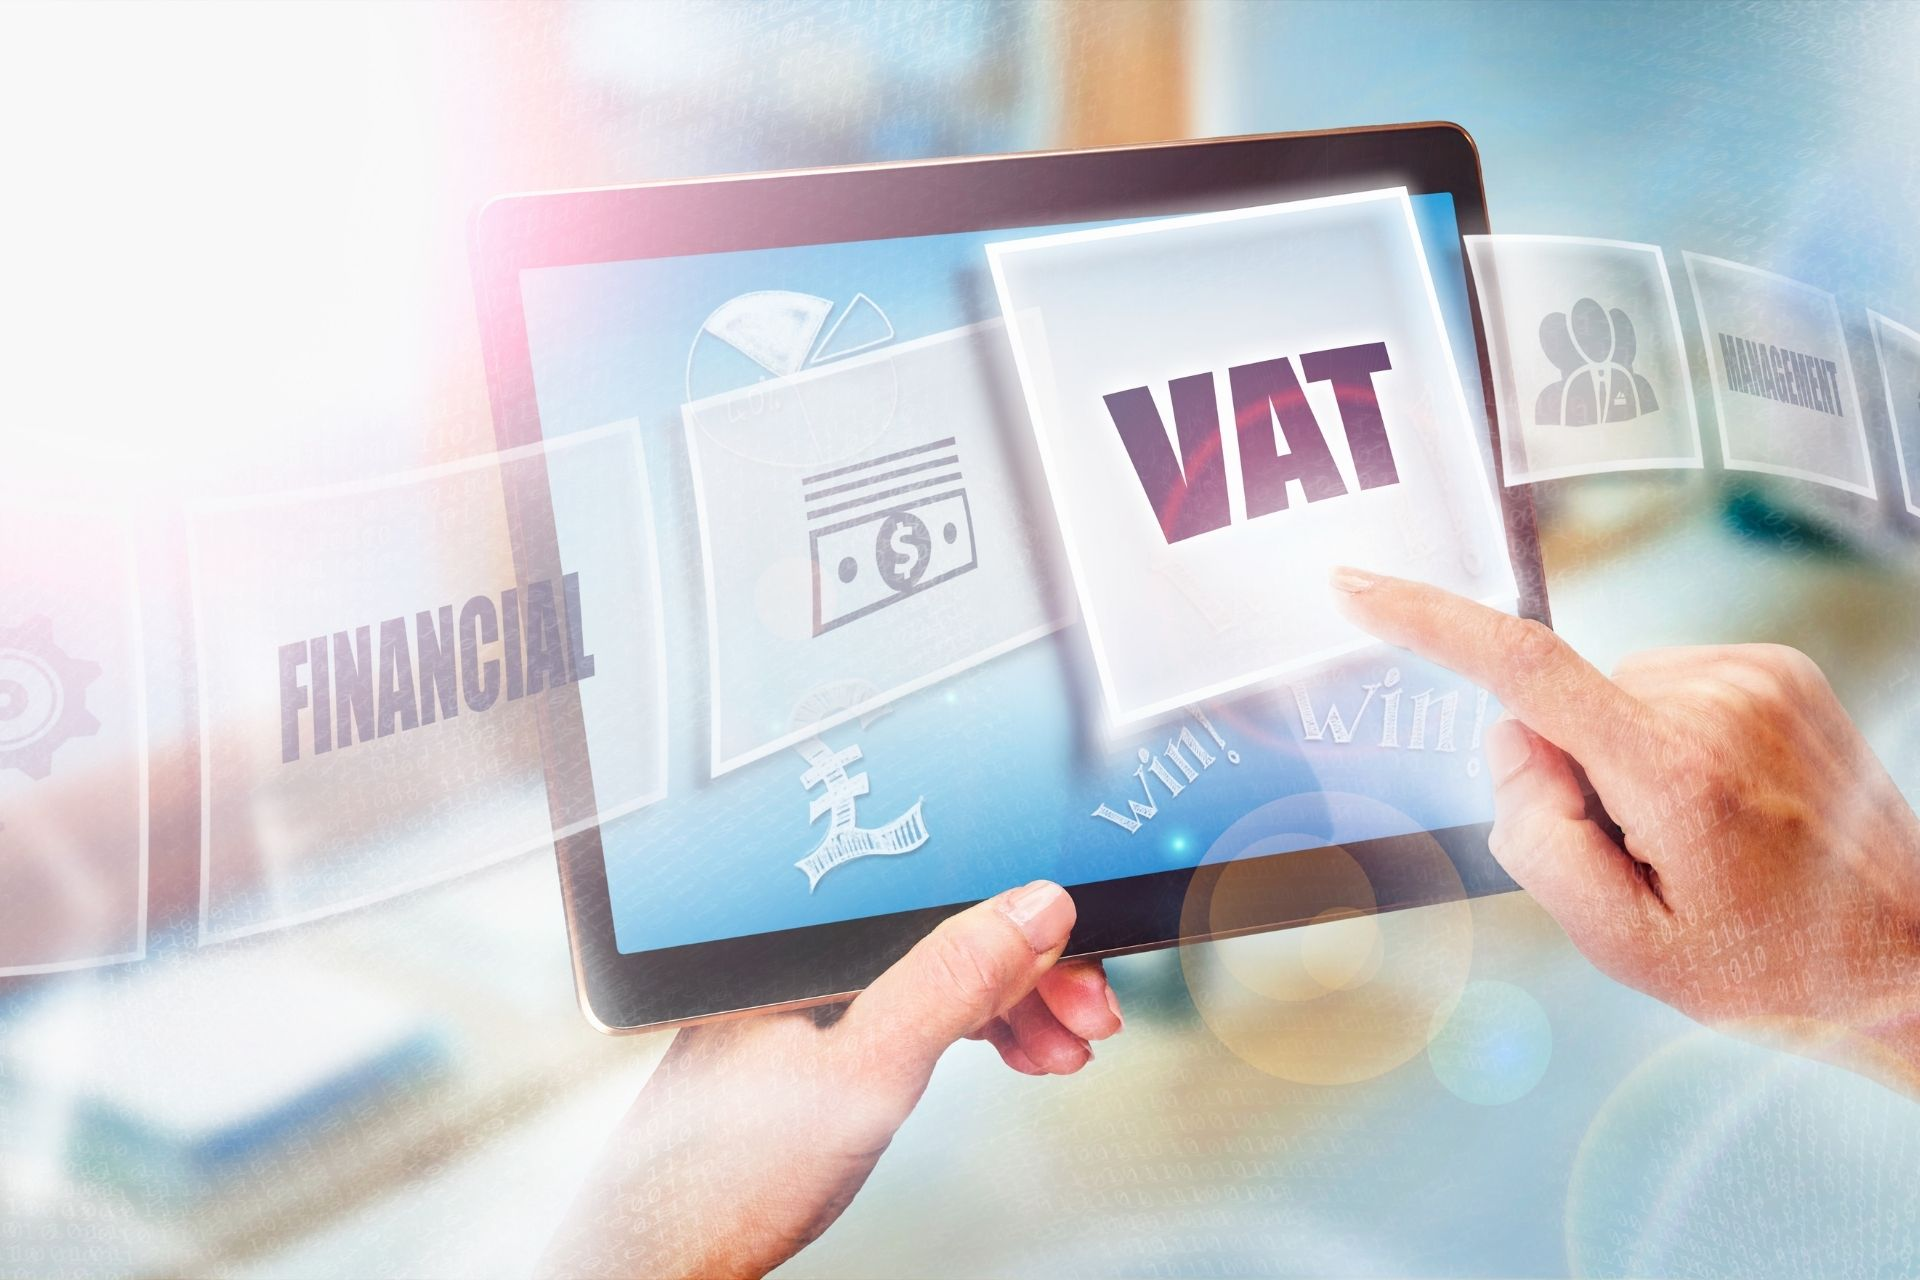 EU VAT Refund Application for YE 2020